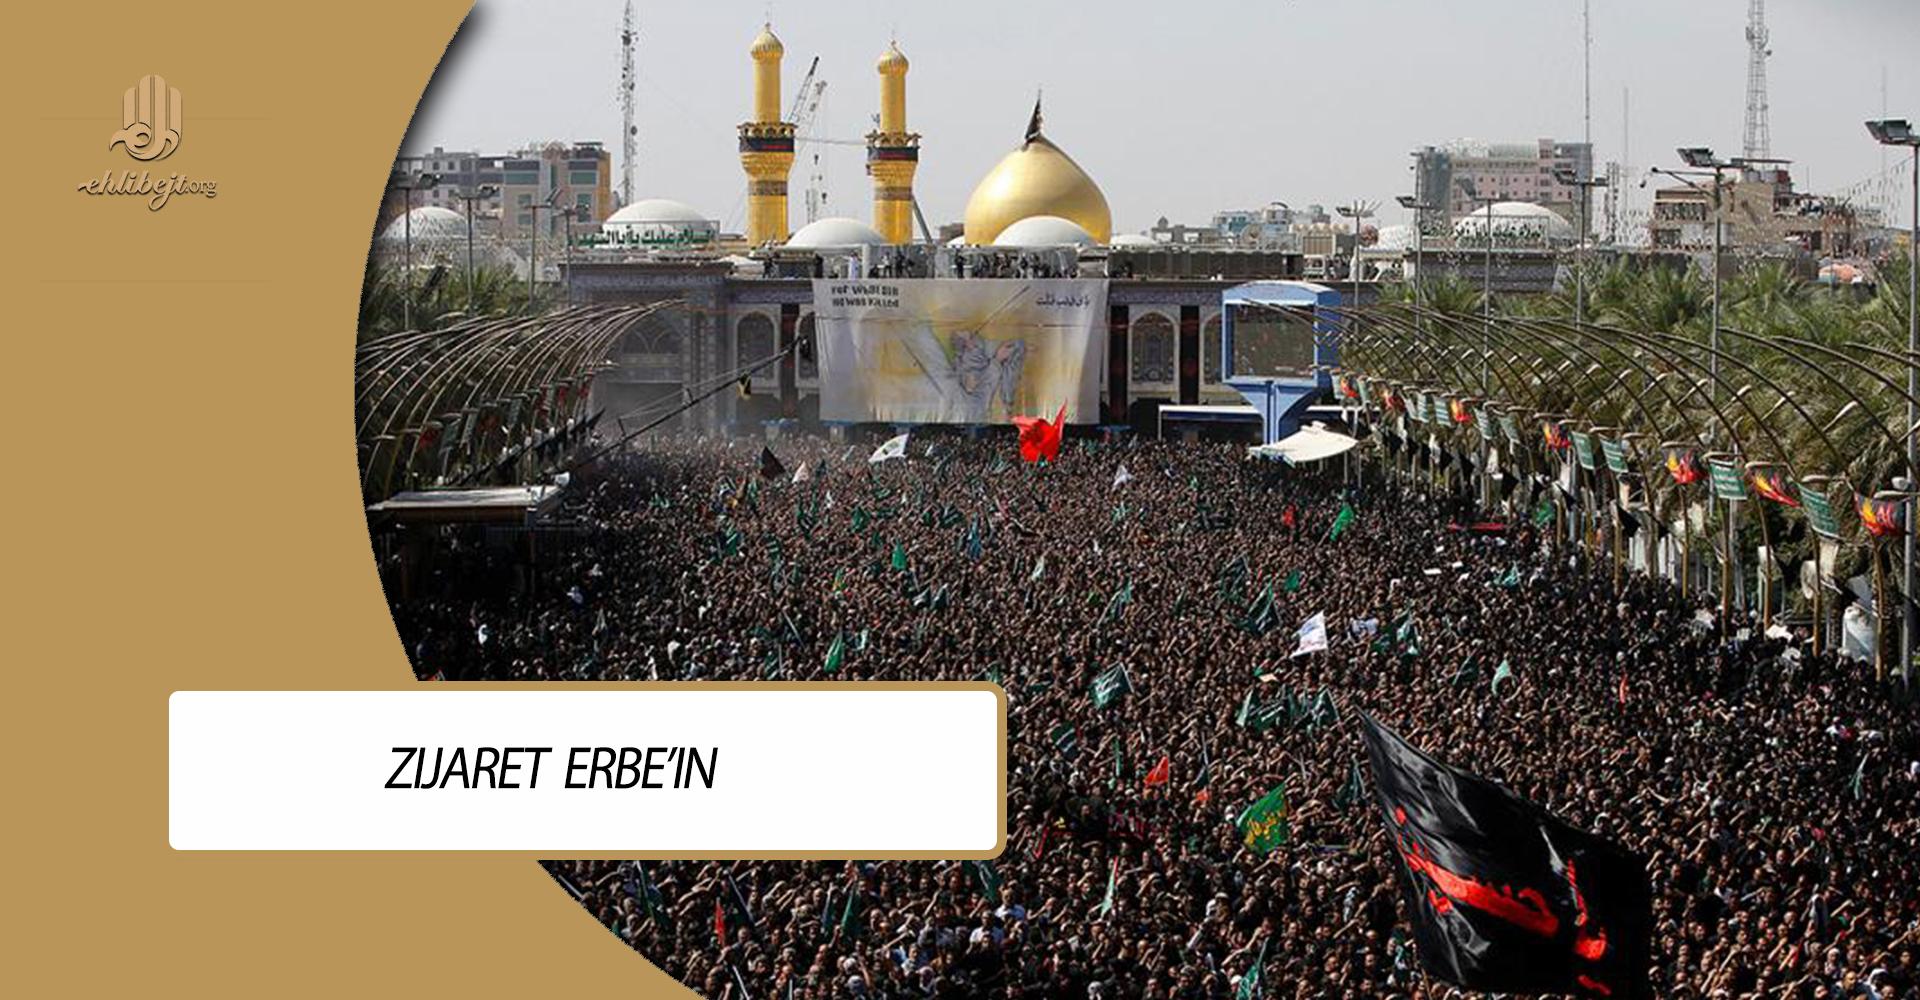 Zijaret Erbe'in